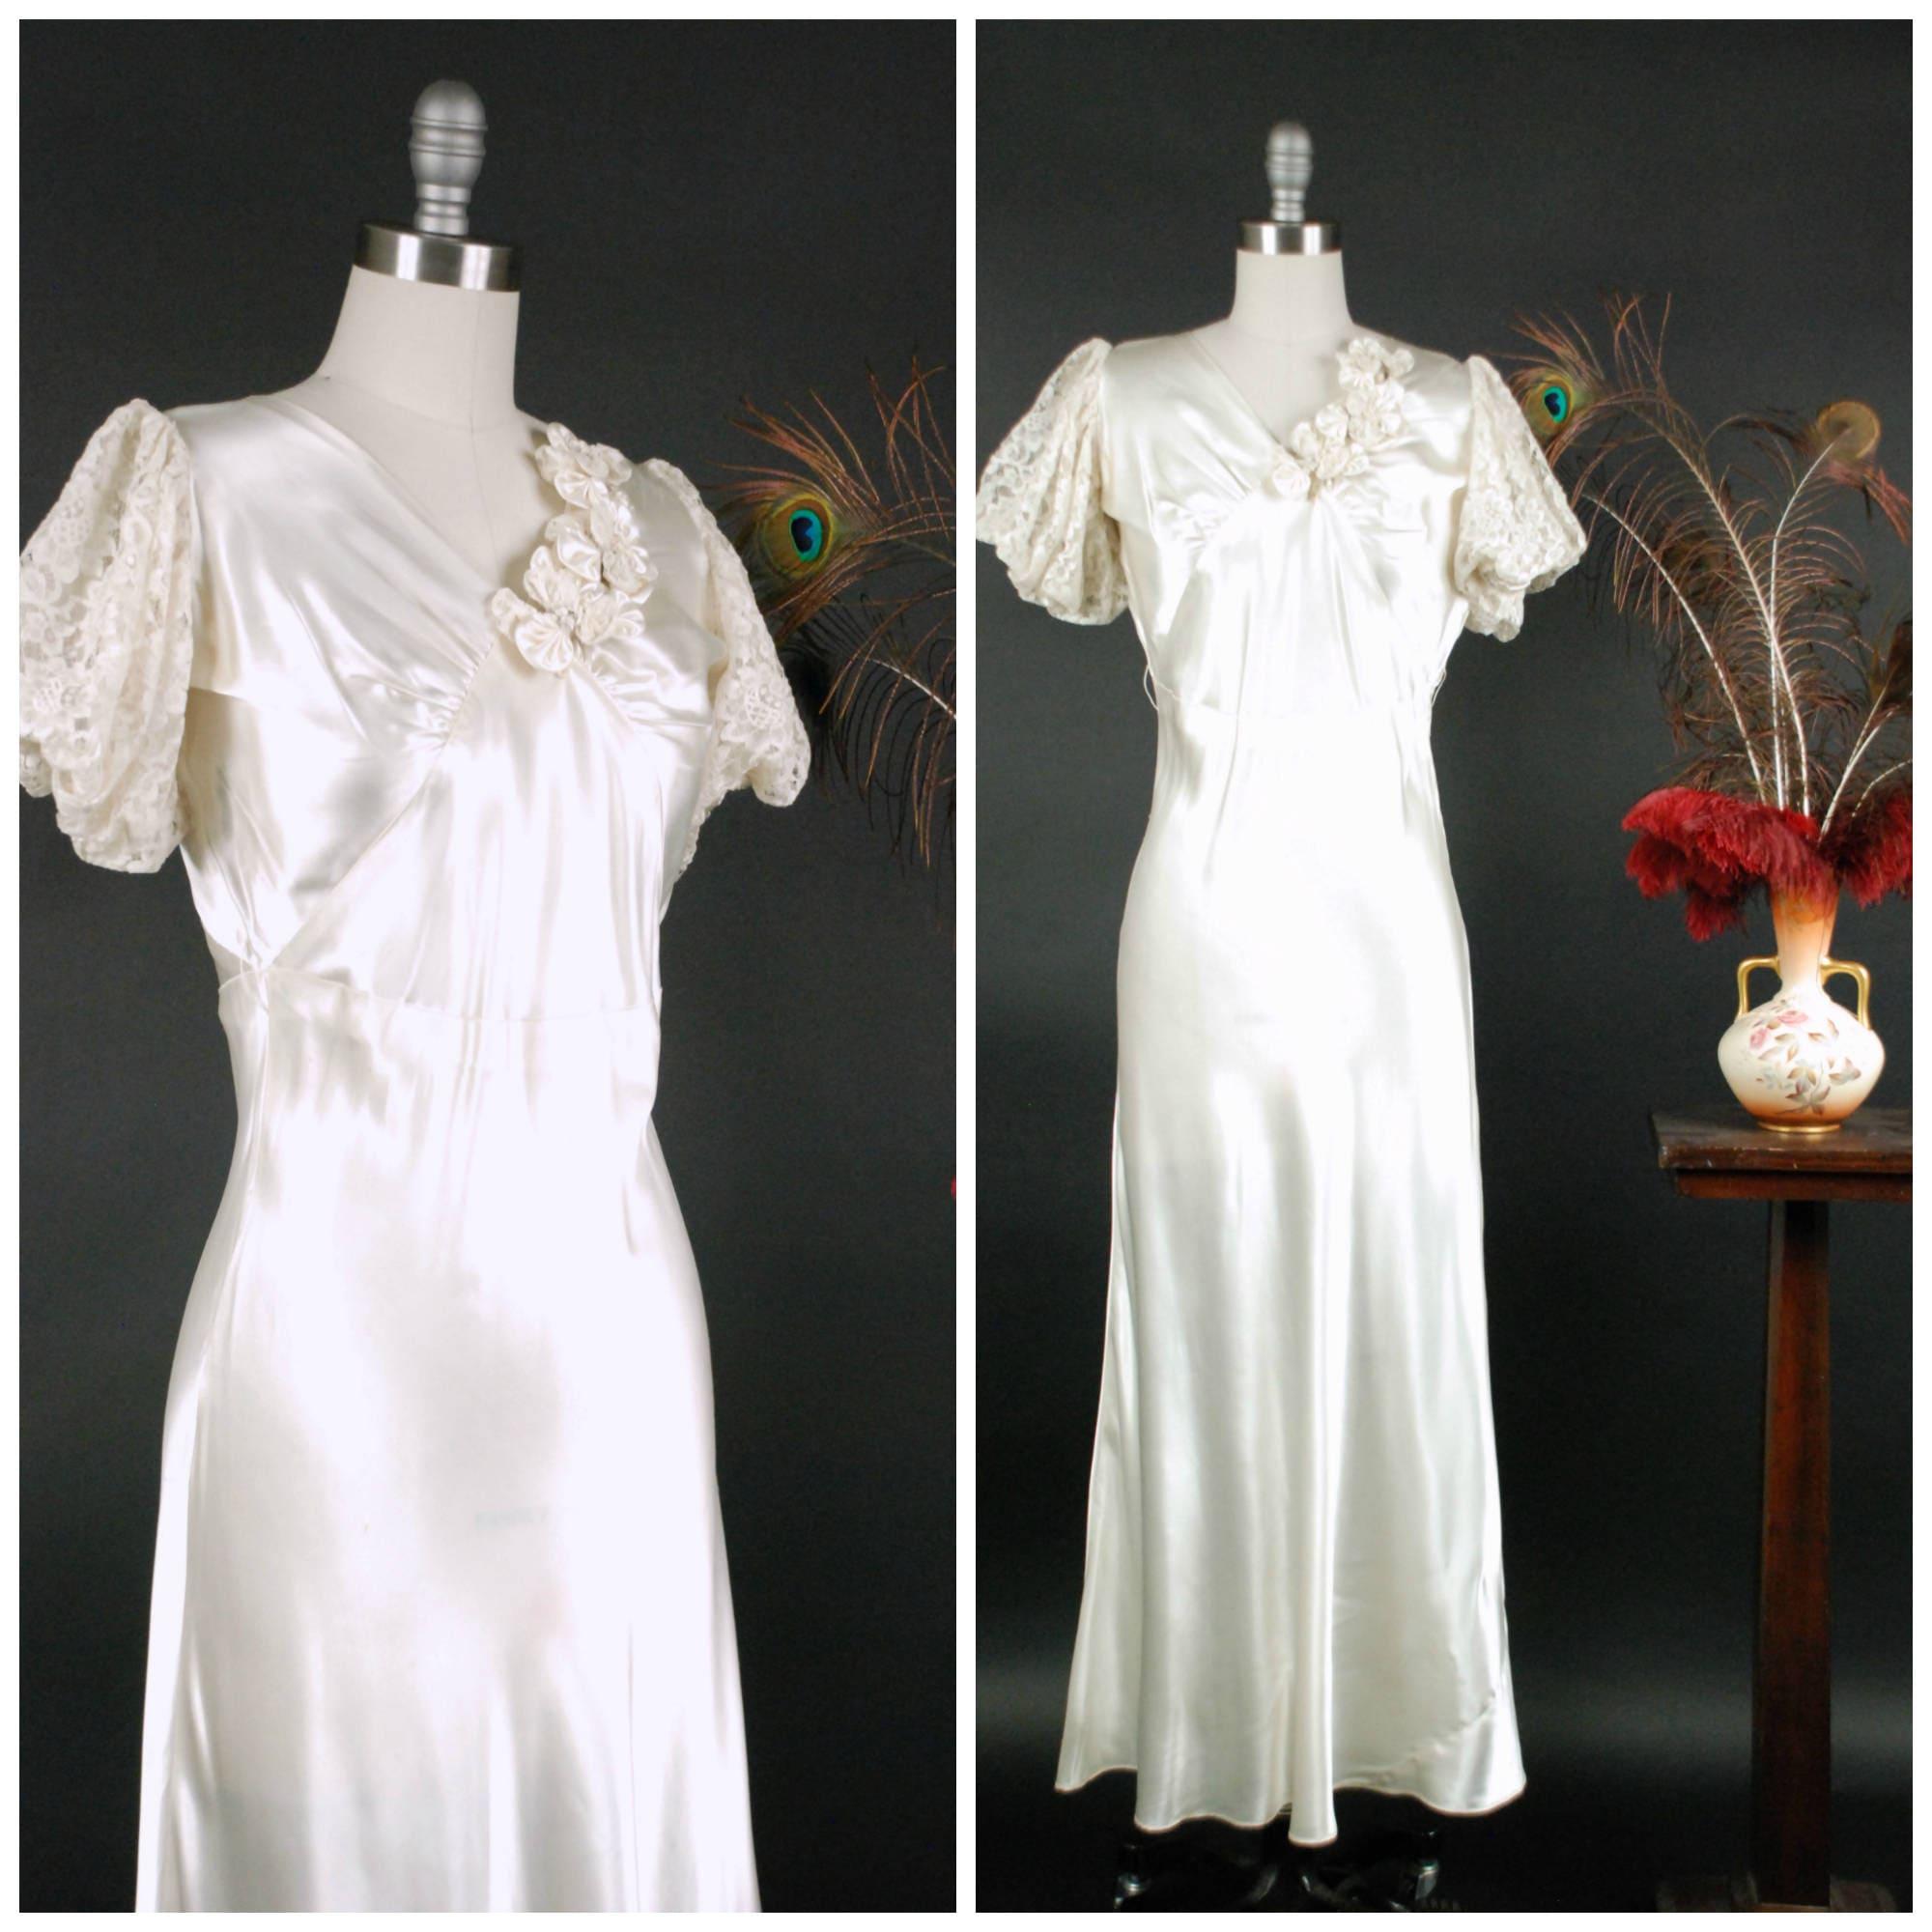 Vintage 1930s Wedding Dress A 1930s Satin Bias Cute Short